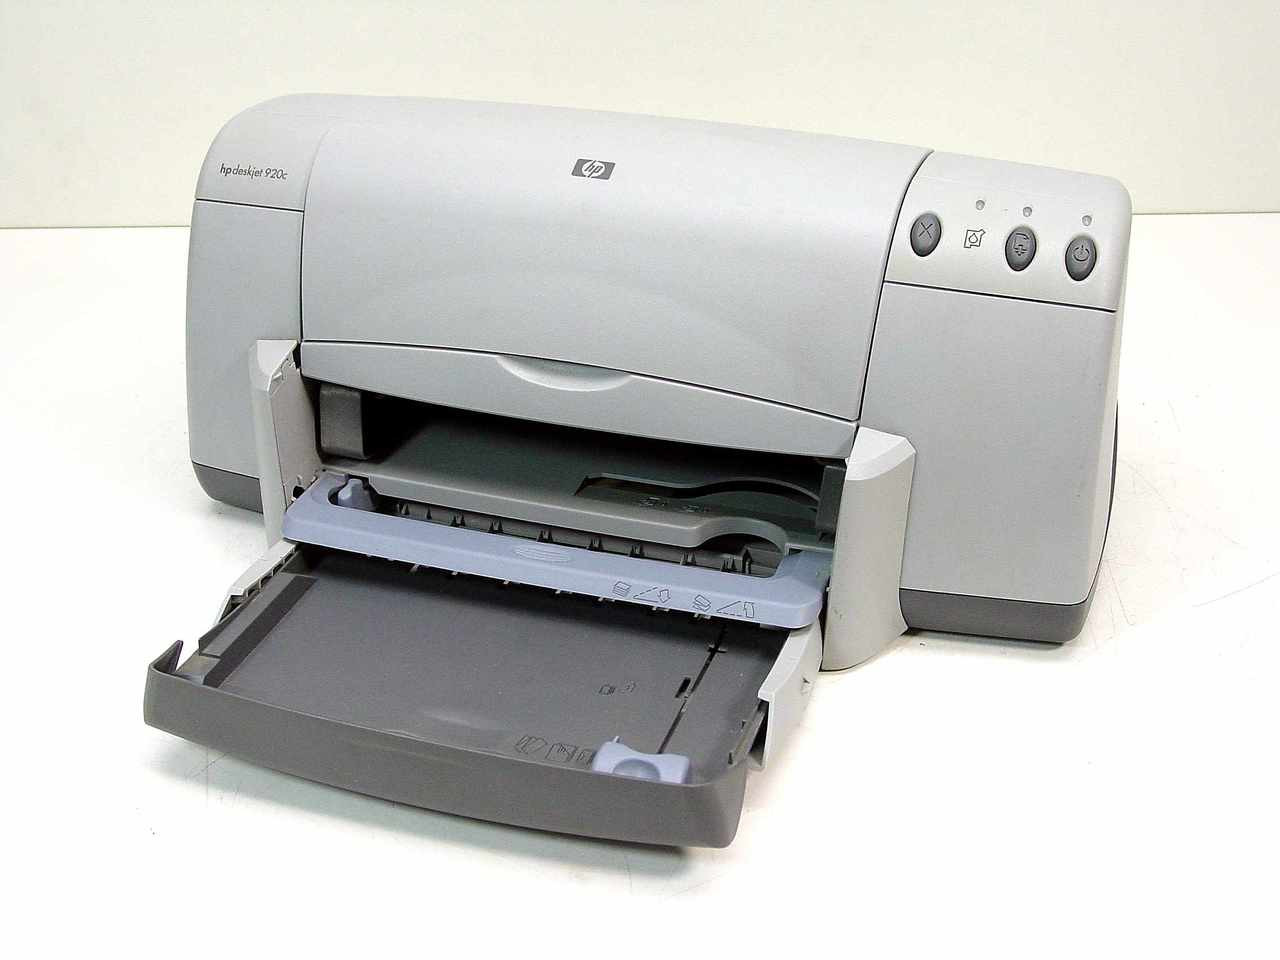 HP Deskjet 920c Printer series | HP® Customer Support